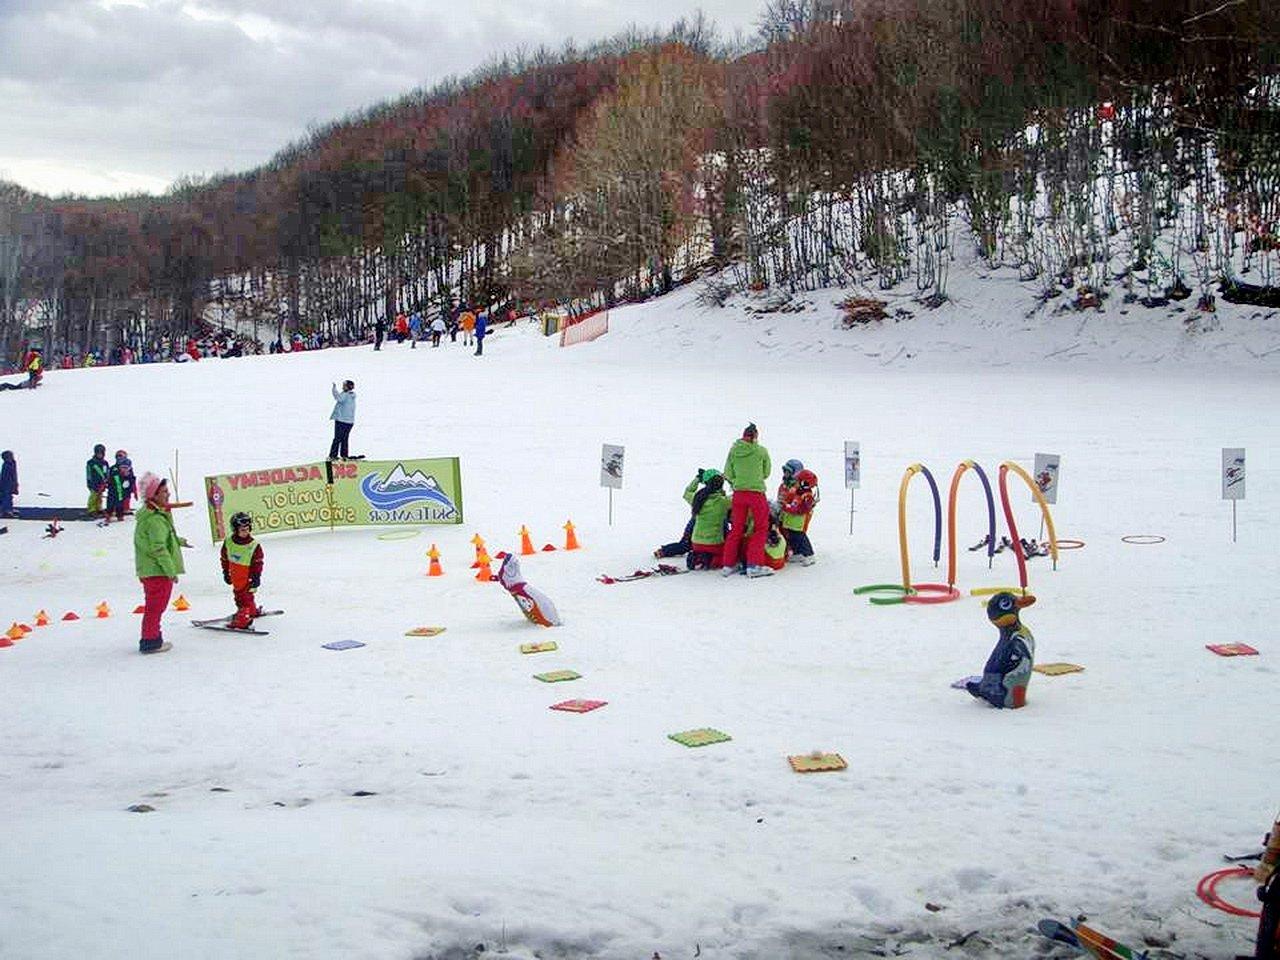 skiteam.gr-ski-academy-thessaloniki-2nd-weekend-18-19-january-2015-3-5-pigadiai-01